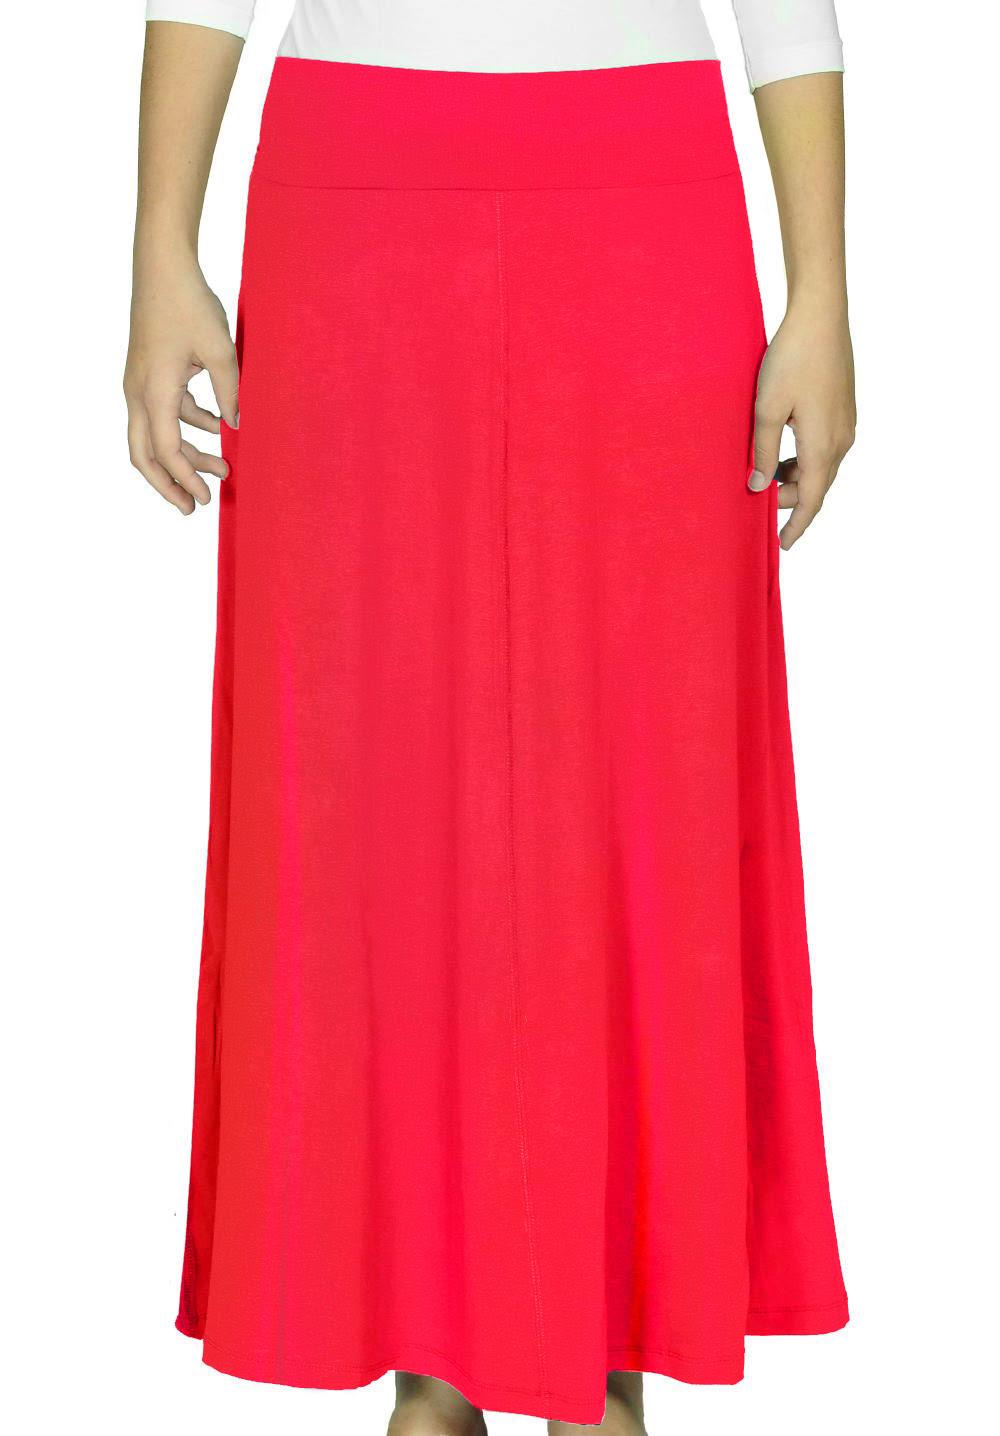 Kosher Casual Kids Big Girlsu0026#39; Modest Long Flowing Maxi Skirt   eBay